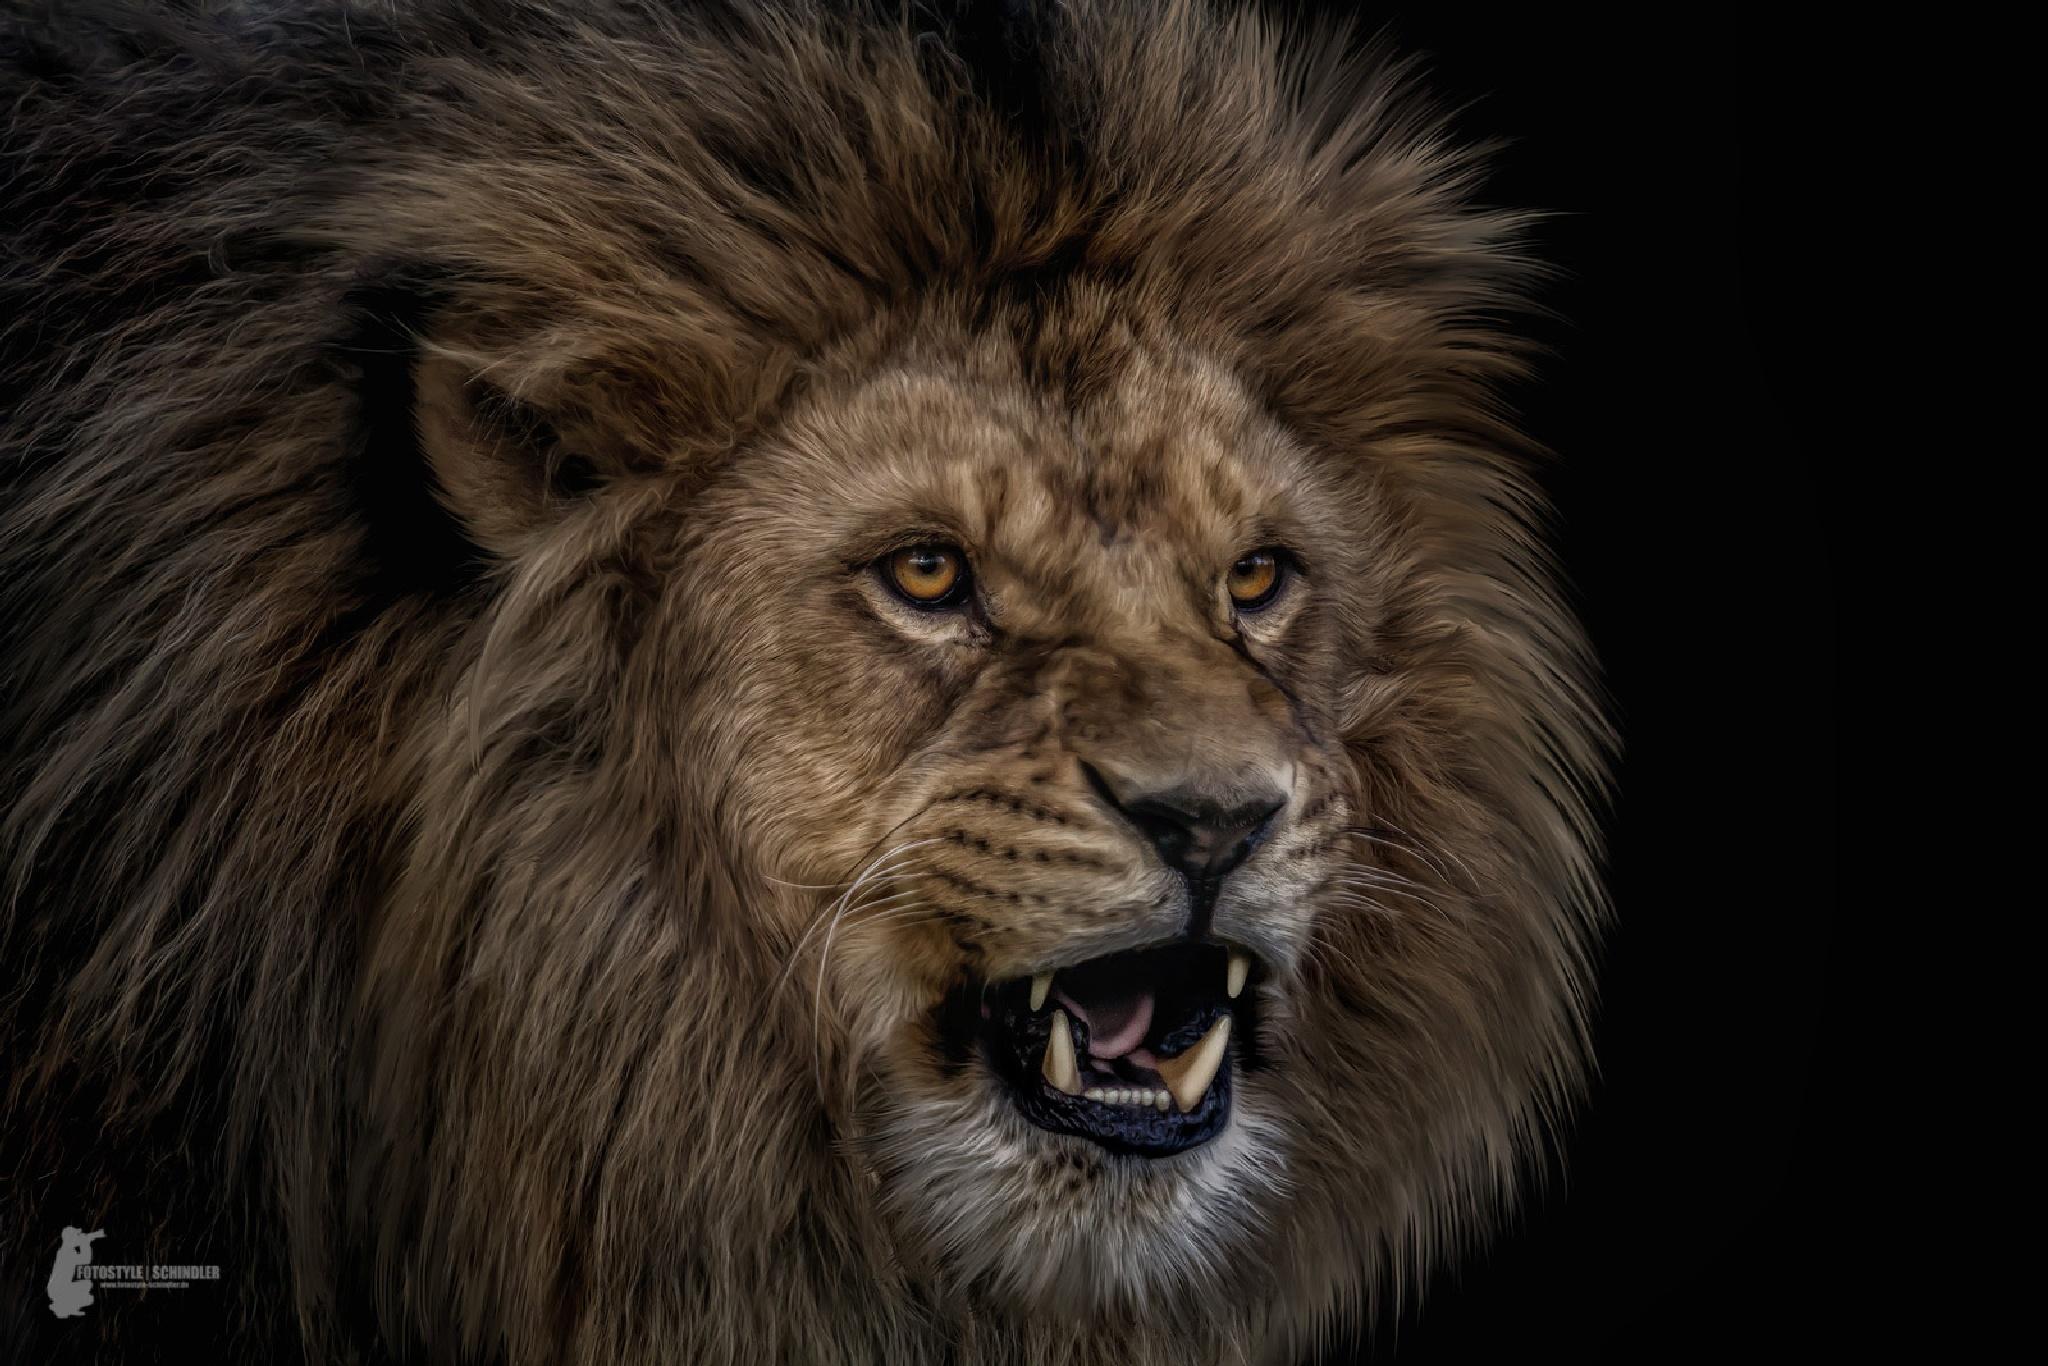 Lion-Portrait by FotostyleSchindler